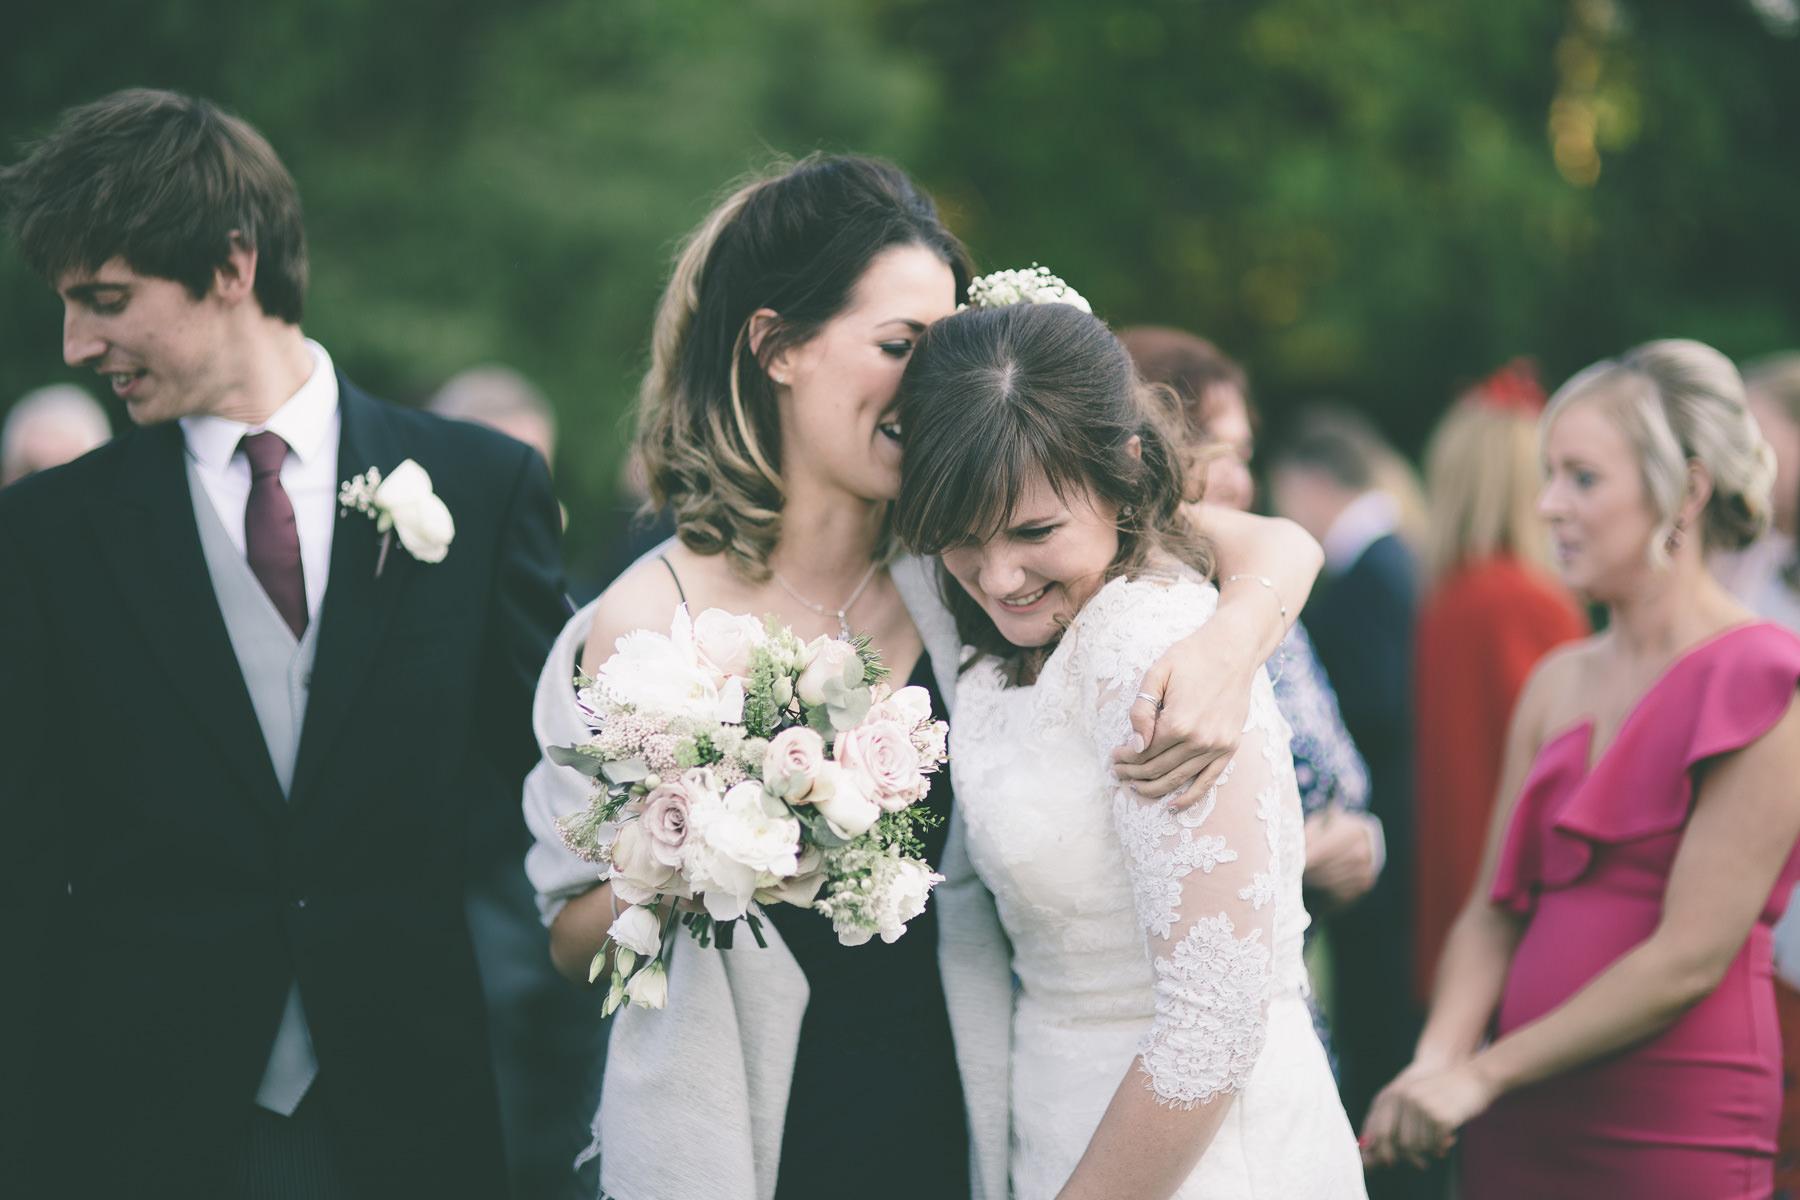 Pamber-Place-wedding-photography-basingstoke-hampshire-211